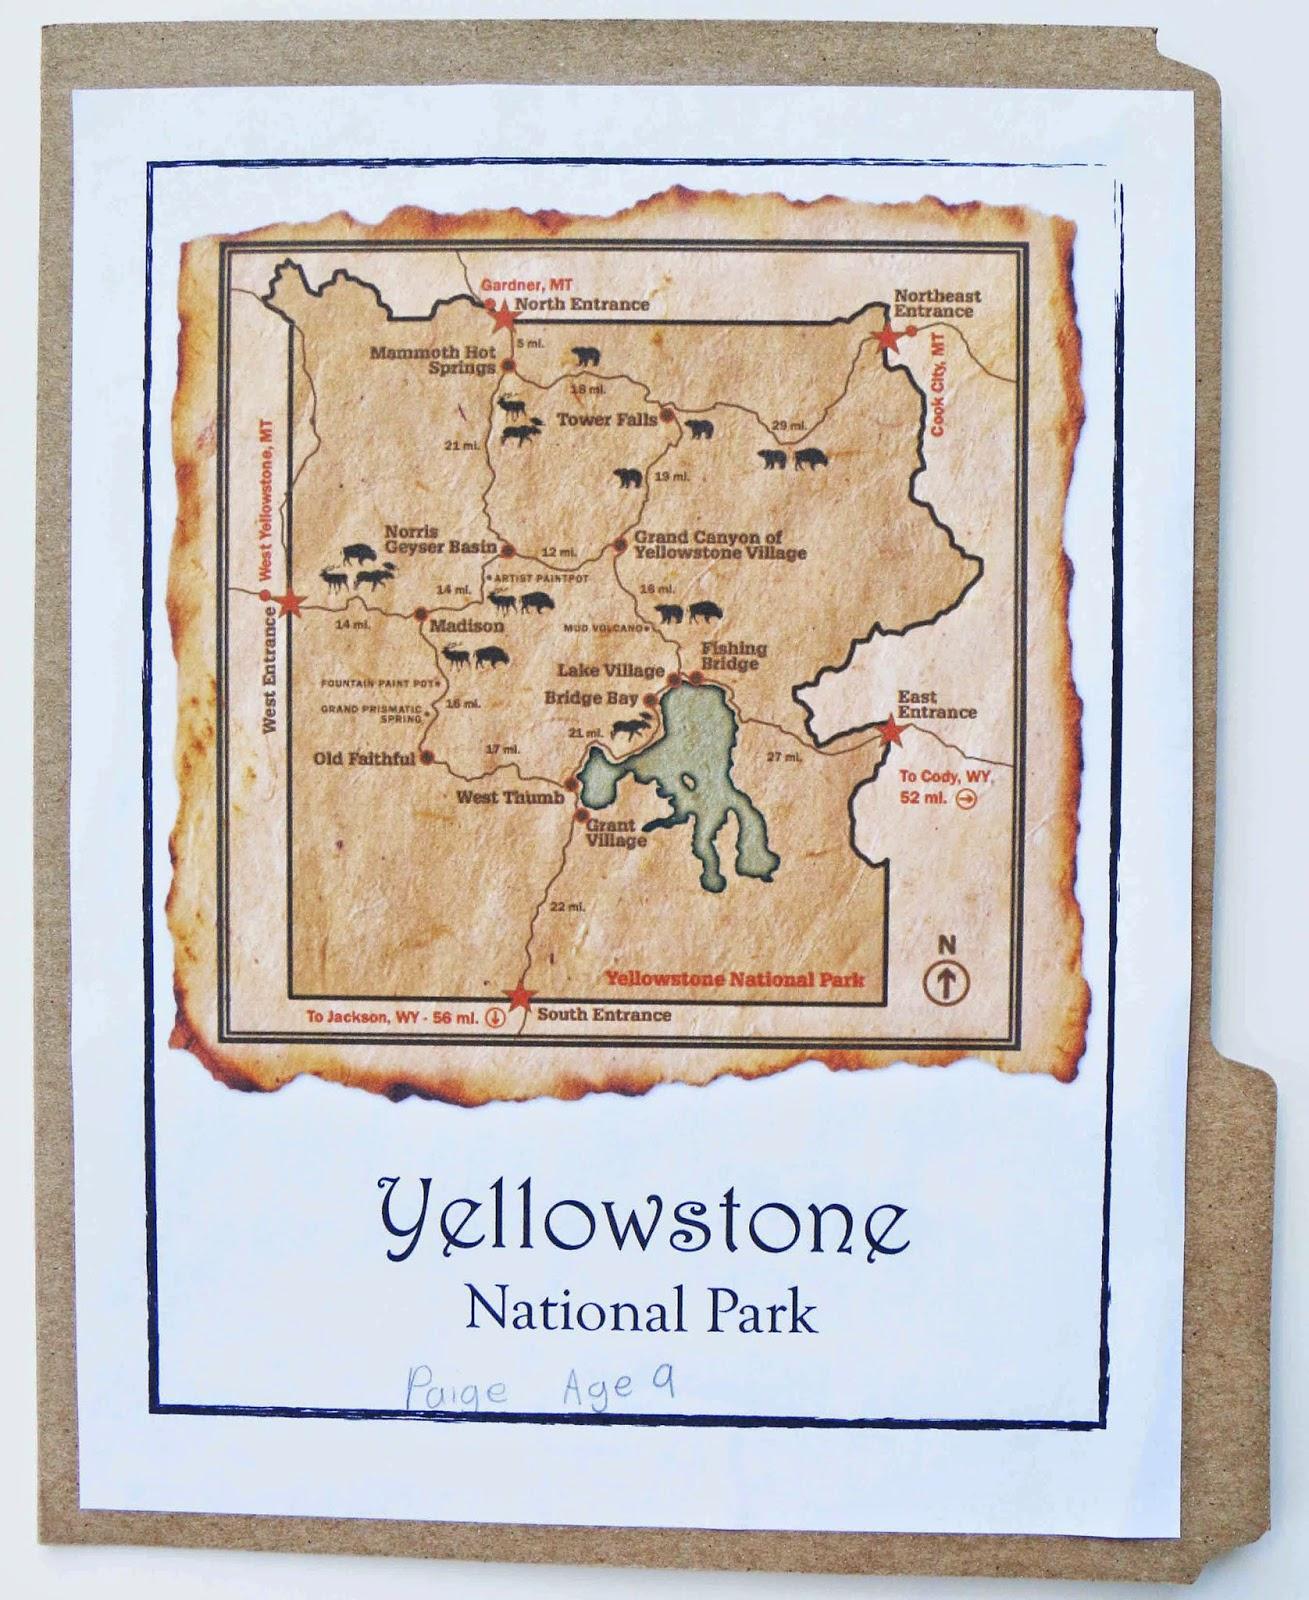 worksheet Yellowstone National Park Worksheets free yellowstone national park lapbook homeschool deals